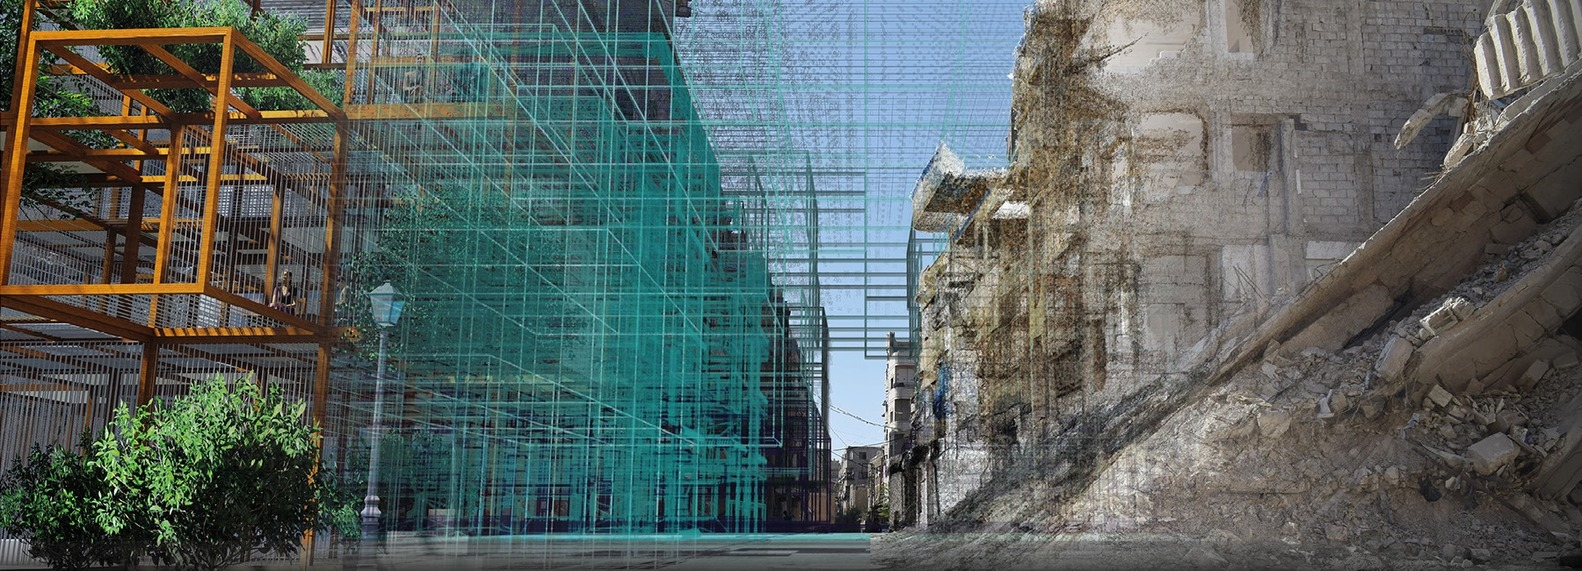 Reconstructing Syria- Post-war architectural development - Sheet4